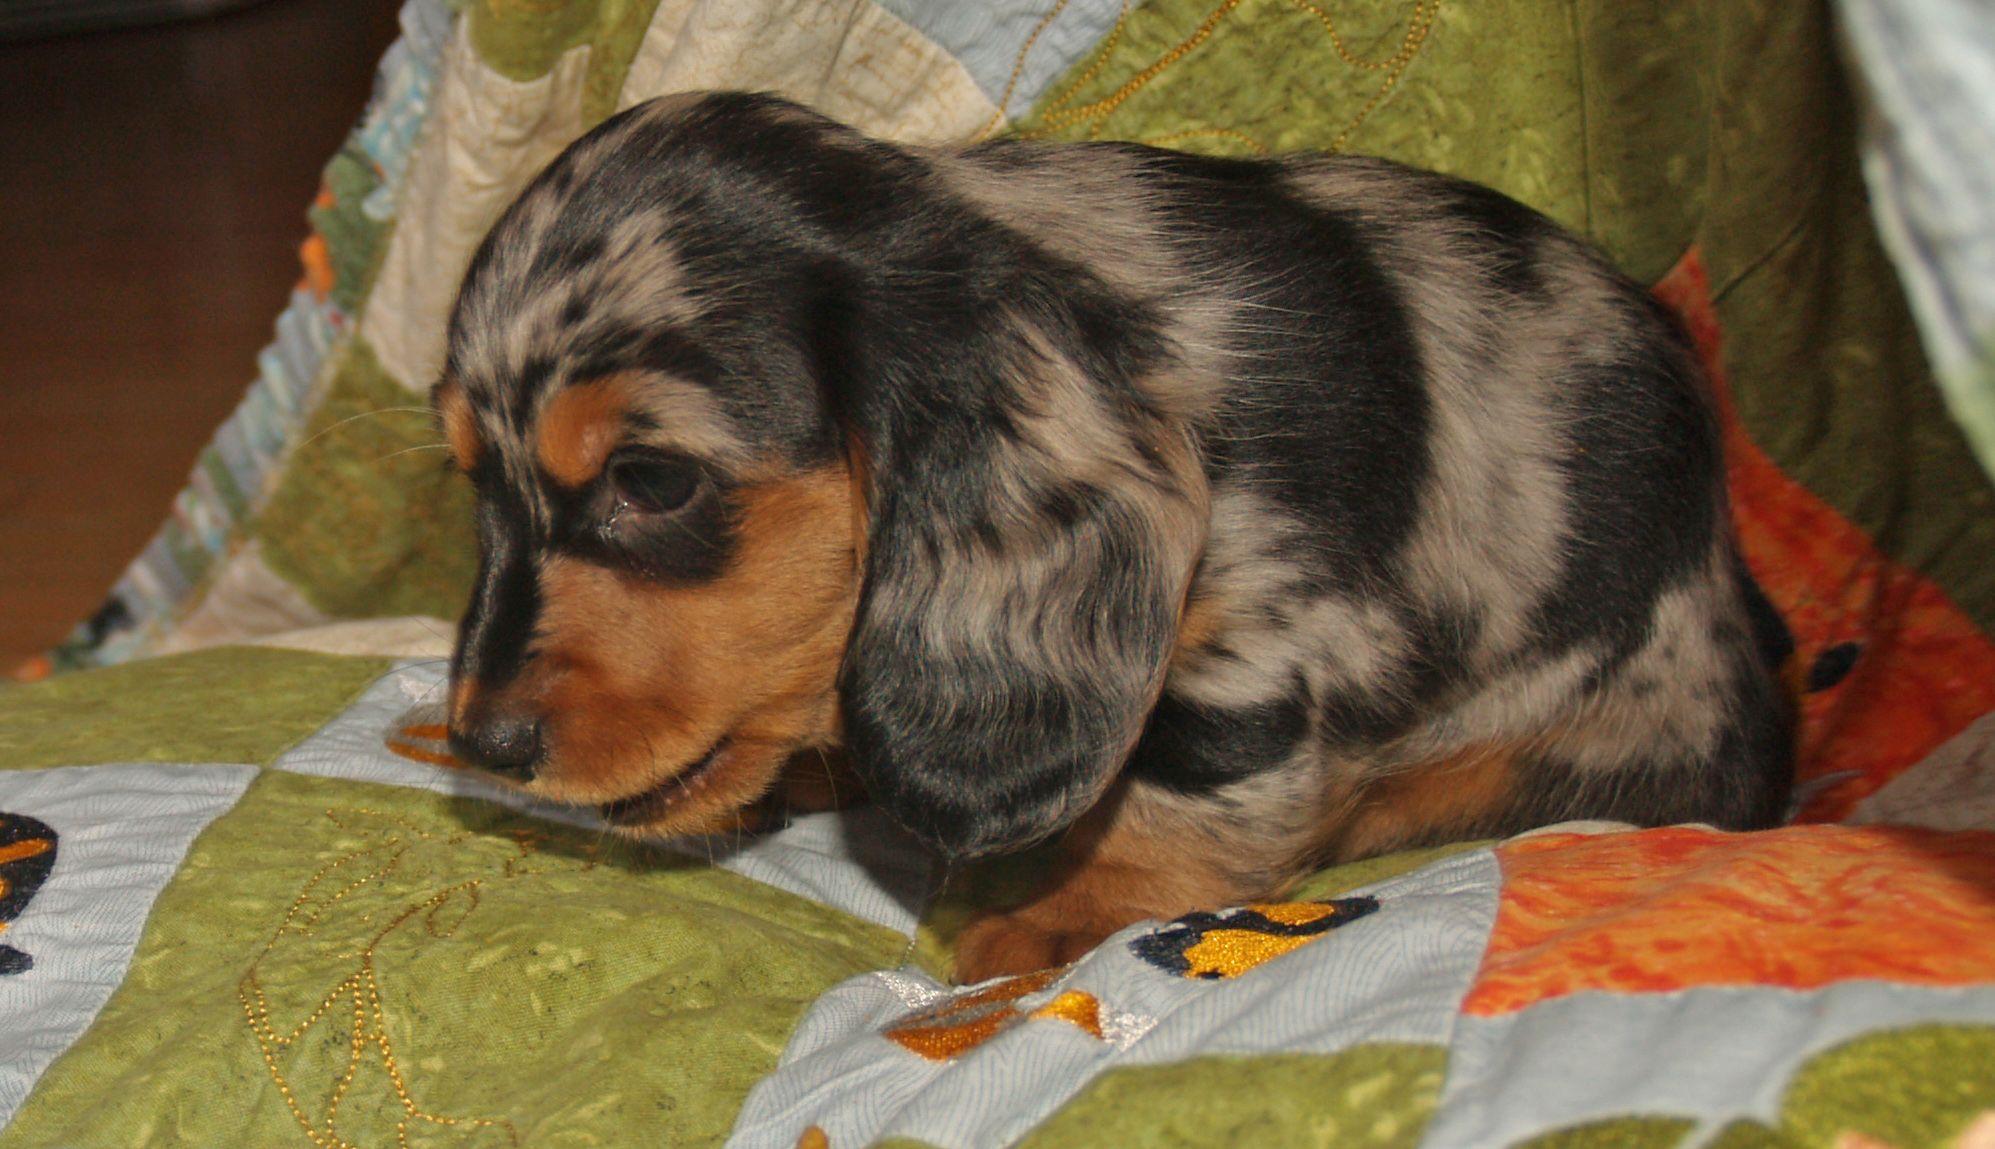 Darling - Long Haired Black/Tan dapple mini dachshund | My ...  Darling - Long ...